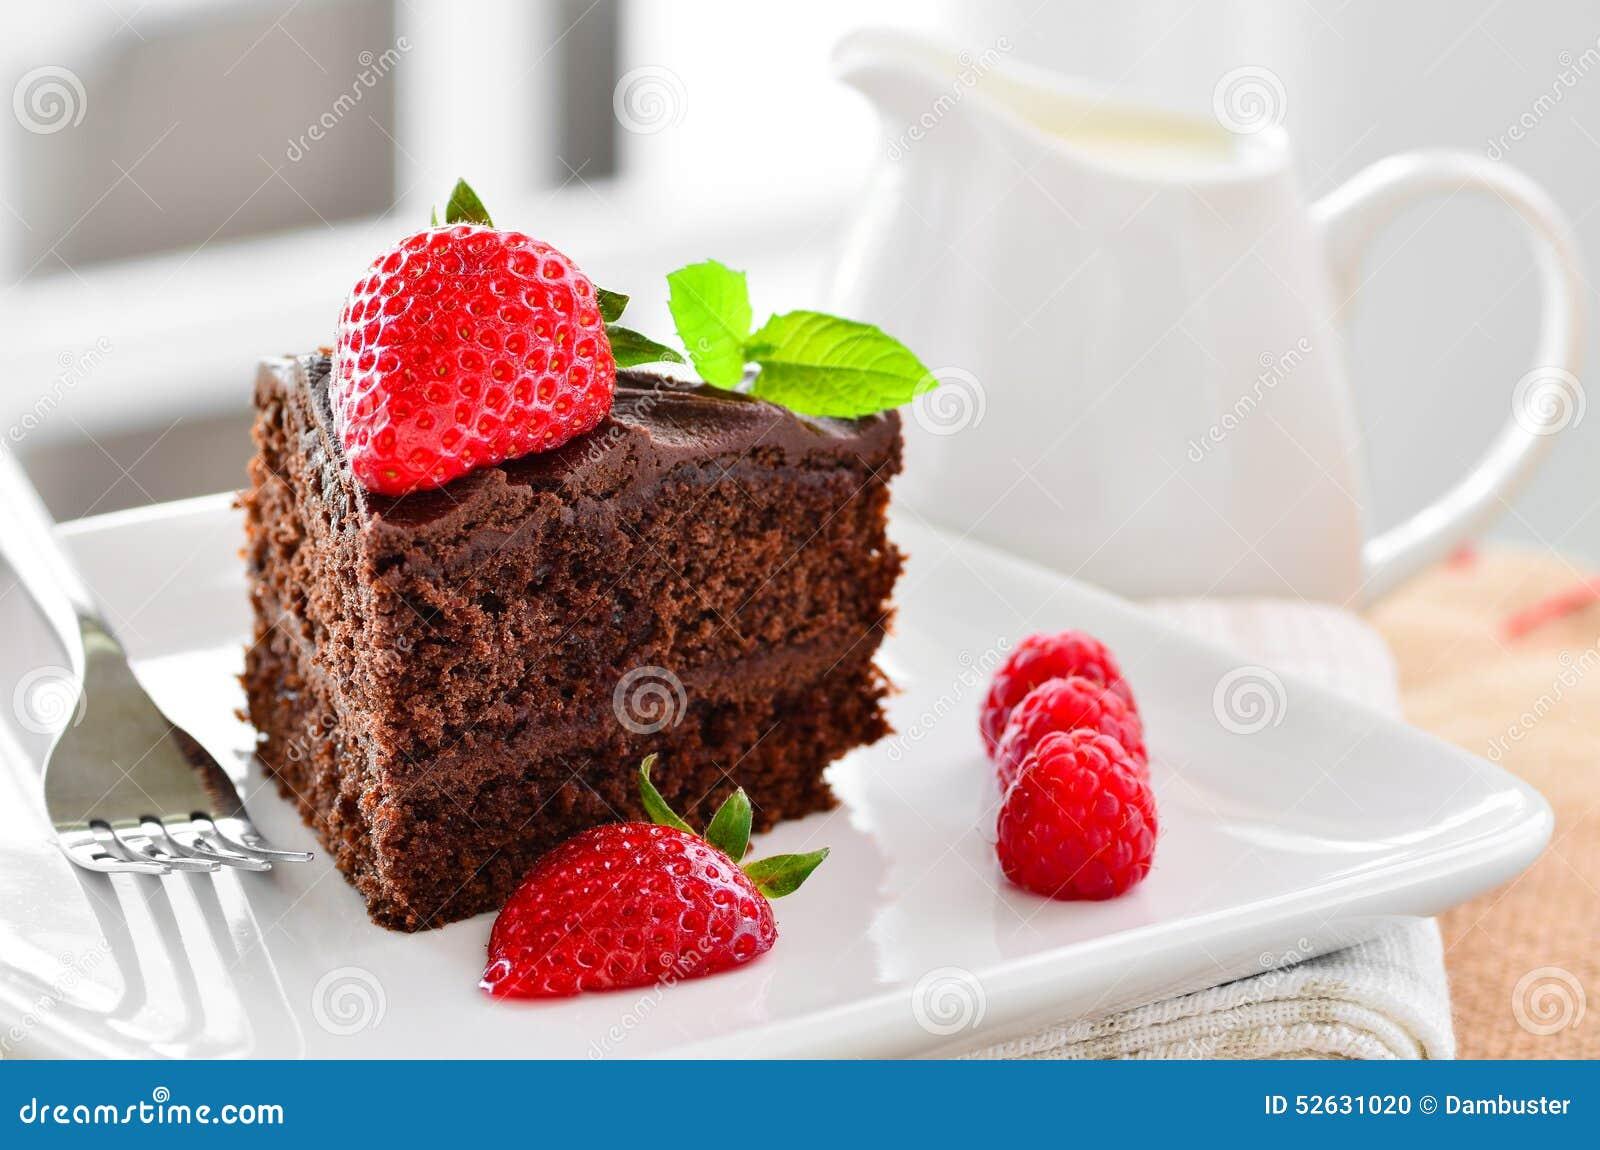 Chocolate Fudge Cake Calories